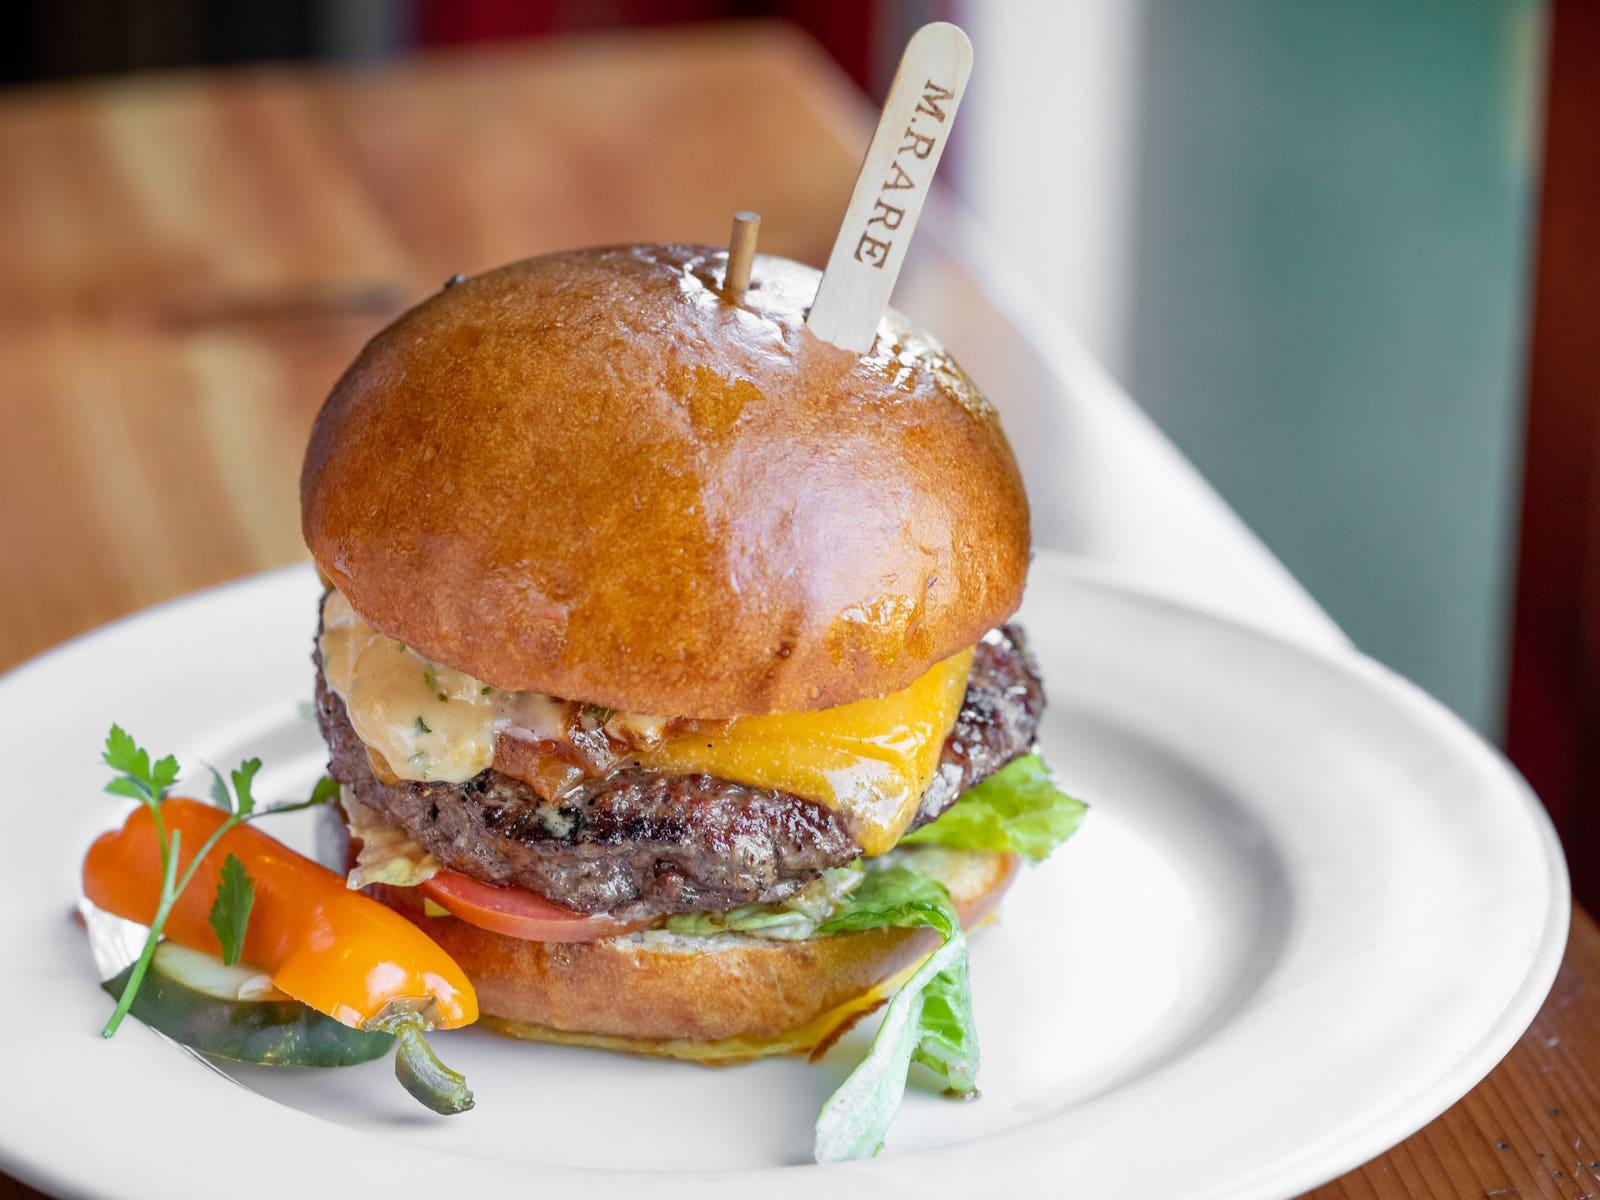 Oak-Charred Simmzy's Burger